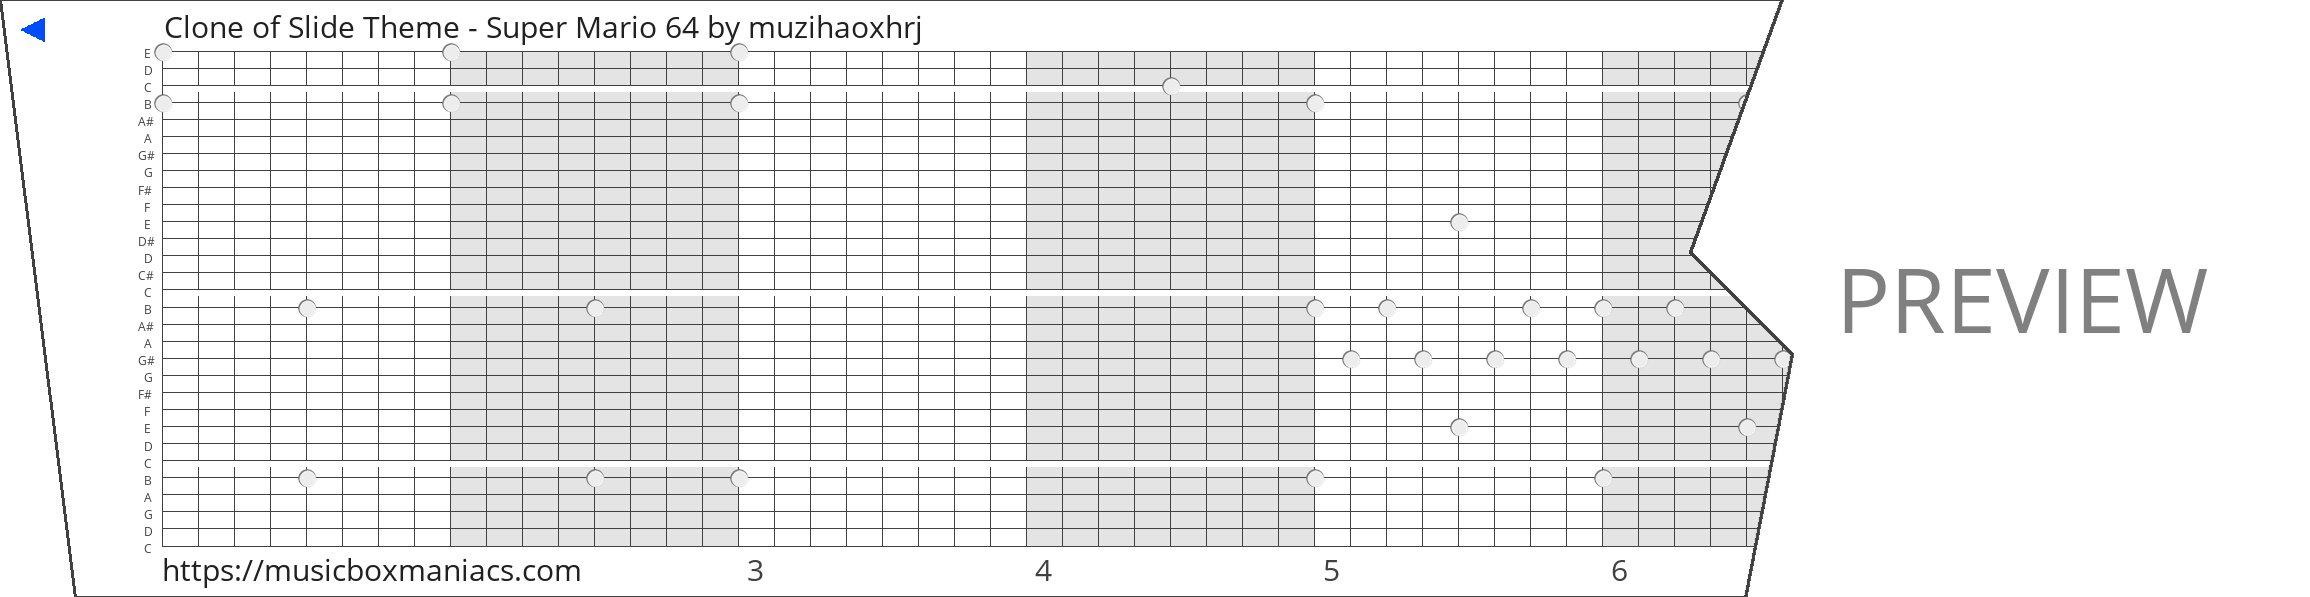 Clone of Slide Theme - Super Mario 64 30 note music box paper strip